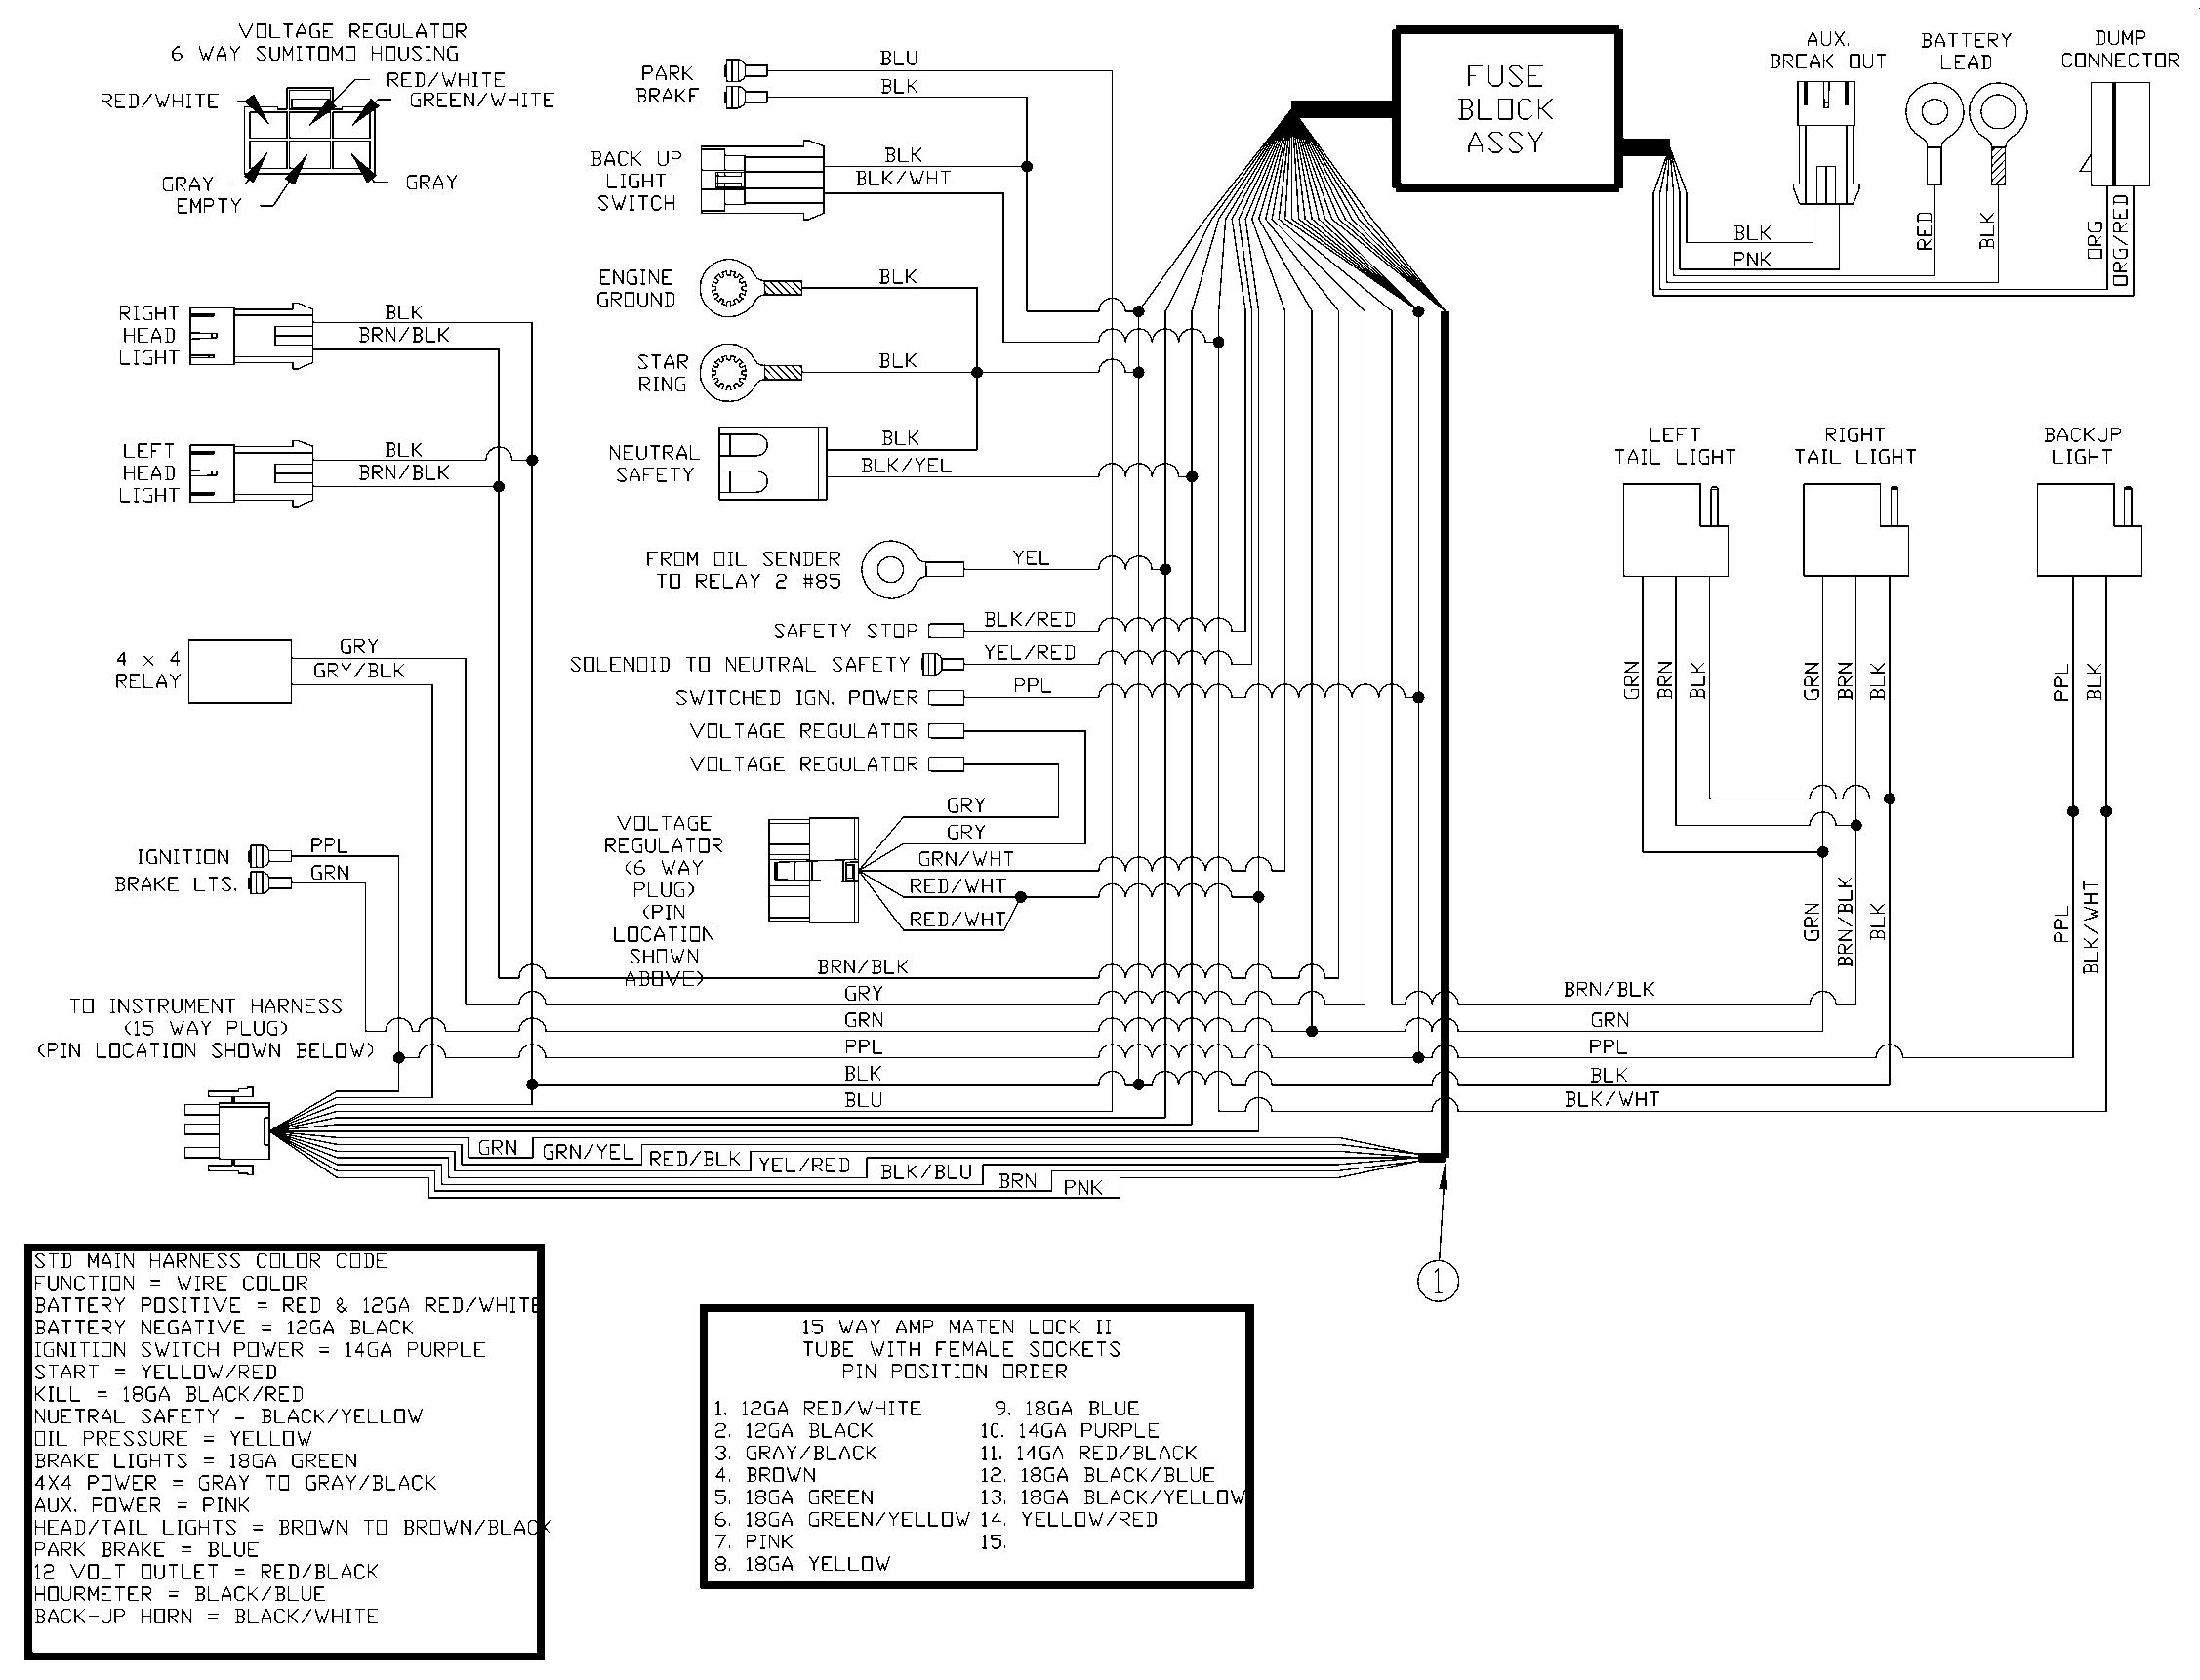 2000 sunnybrook trl wiring diagram basic electronics wiring diagram  2000 sunnybrook trl wiring diagram wiring diagram